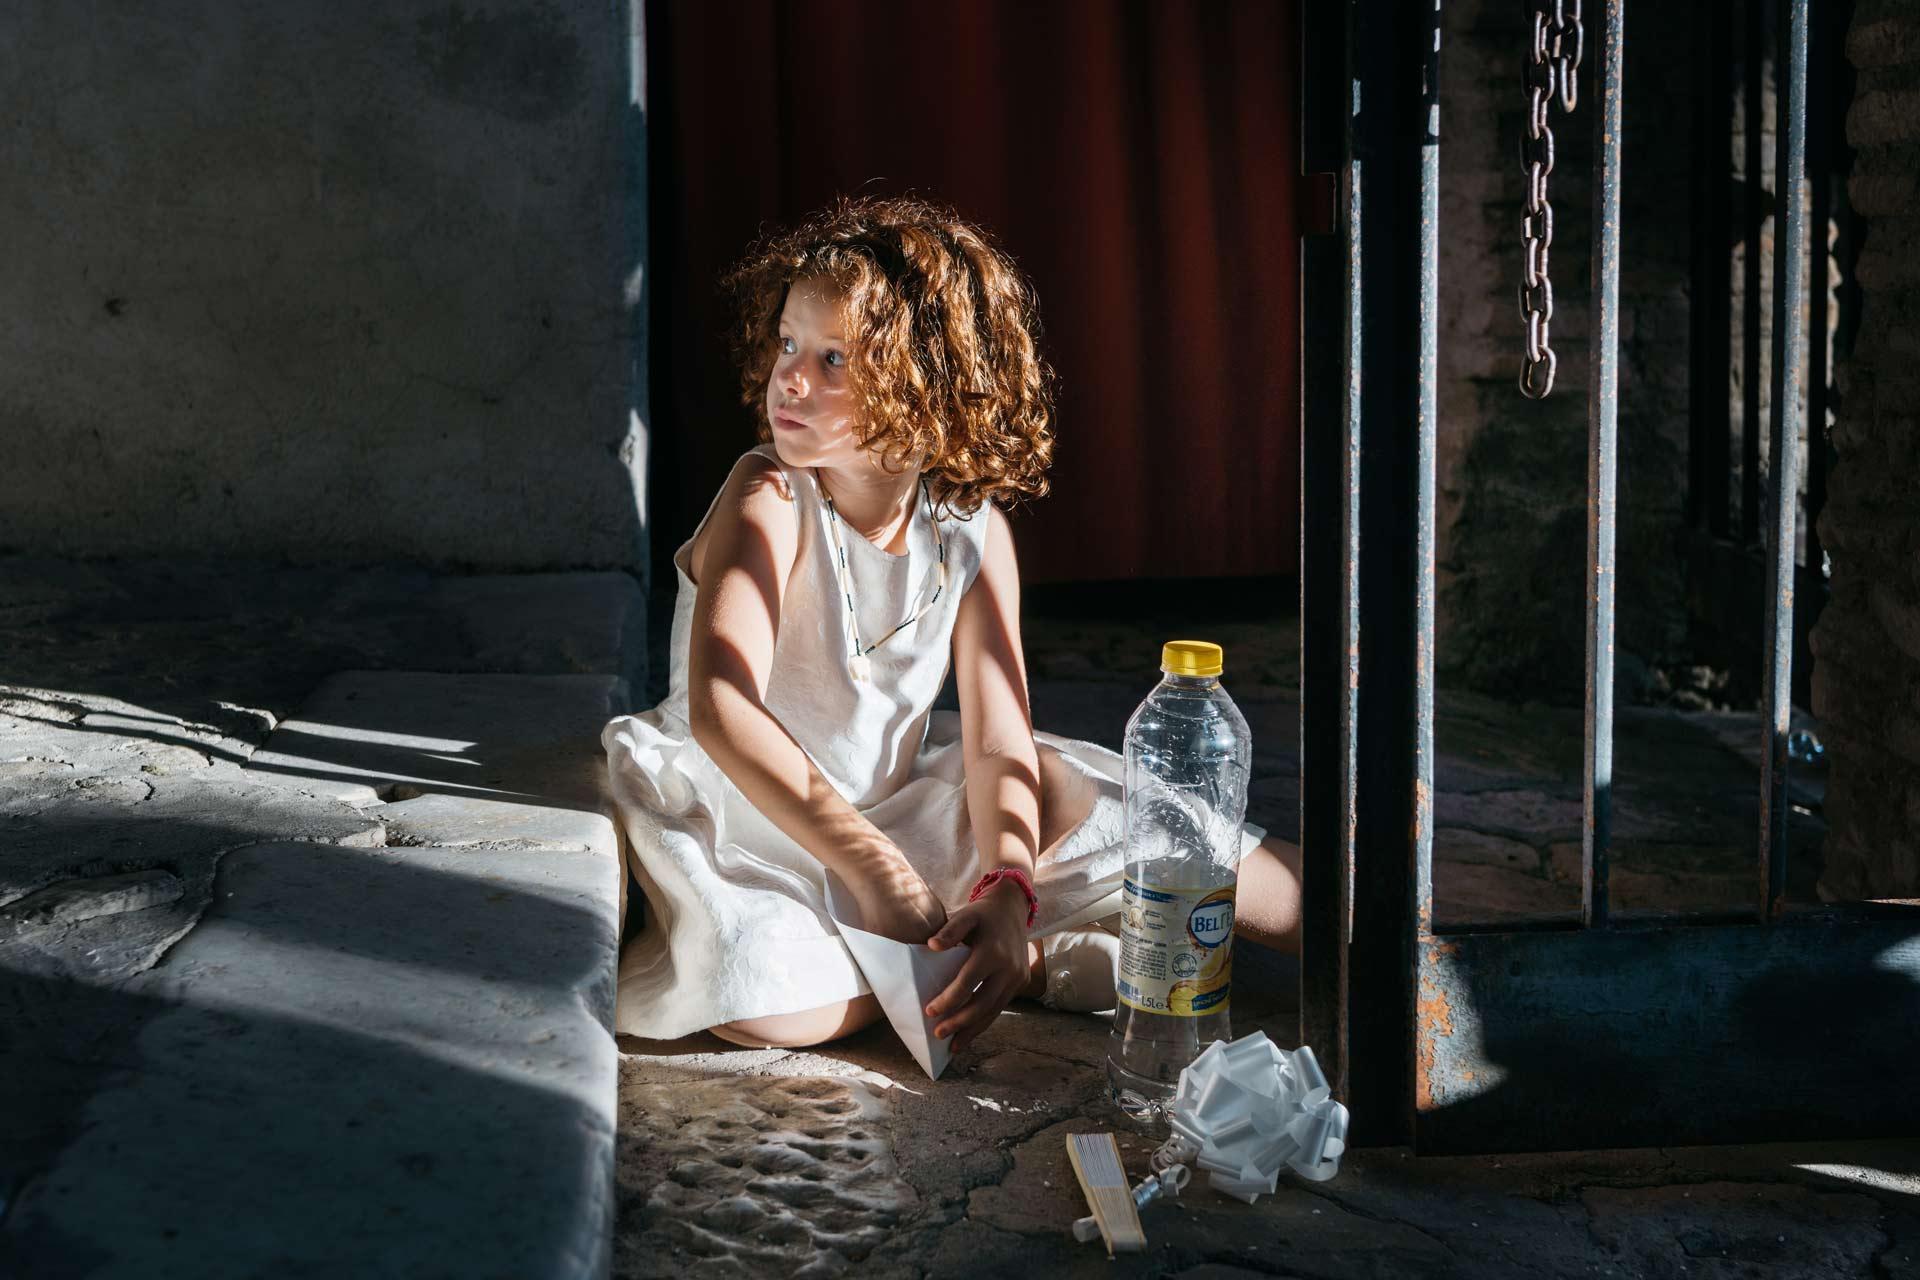 fotografo-matrimonio-roma-s&g-16-simone-nunzi